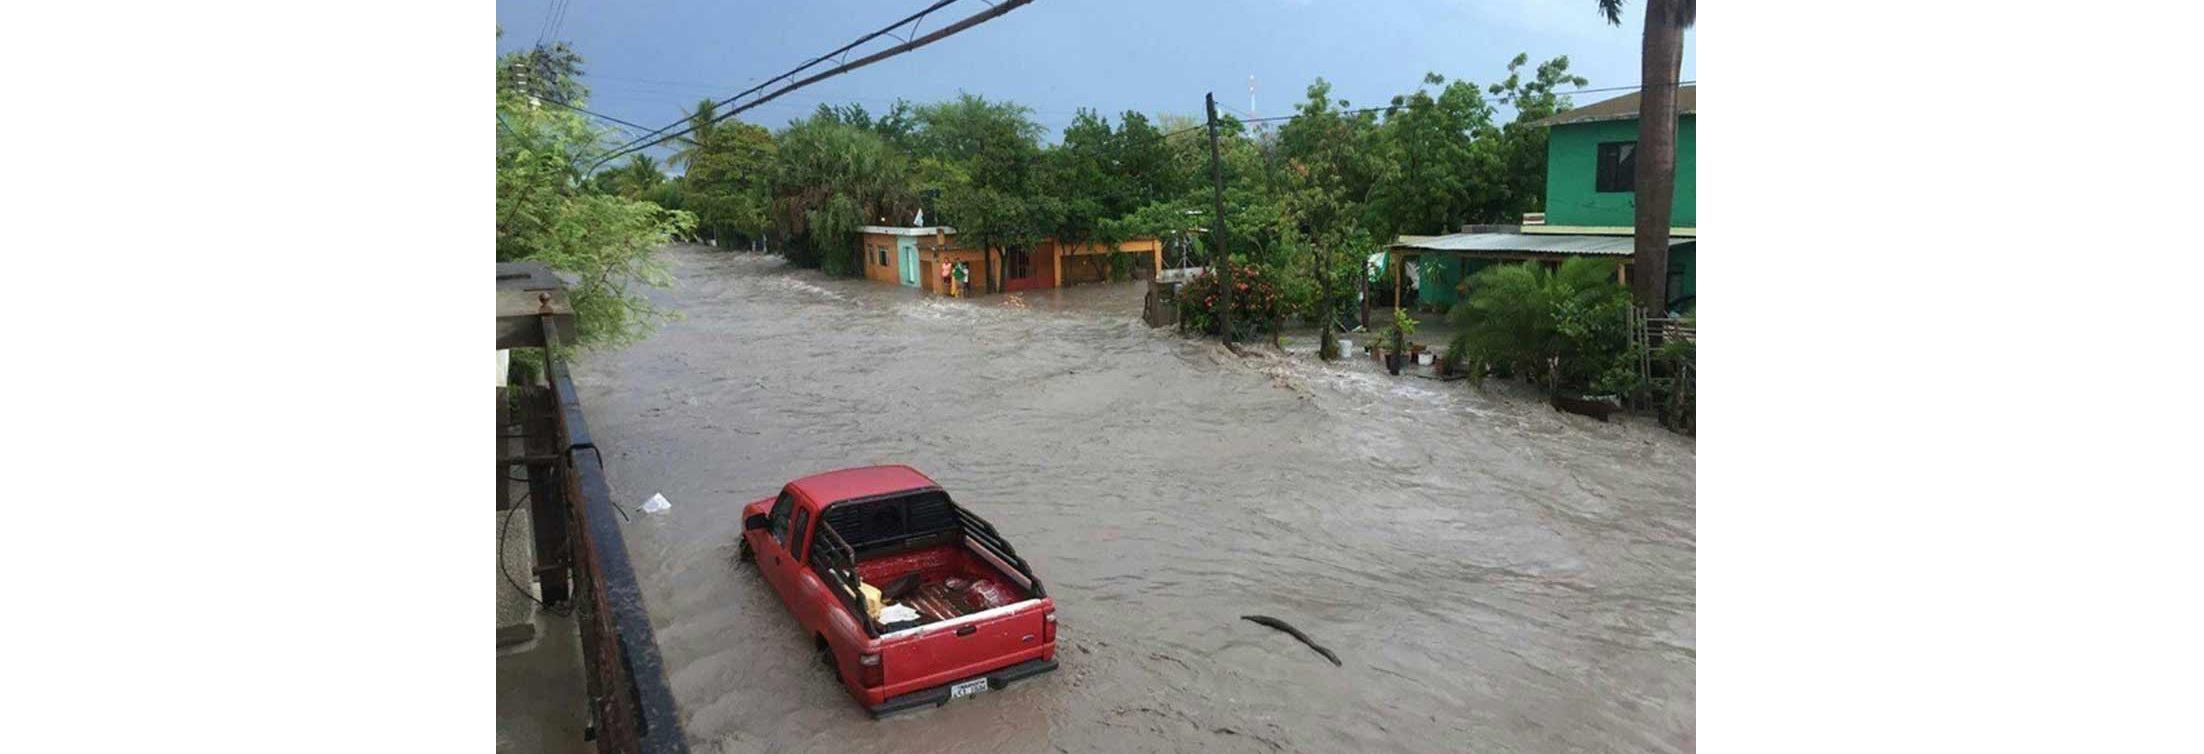 Fuertes lluvias convierten calles de Tamaulipas en ríos